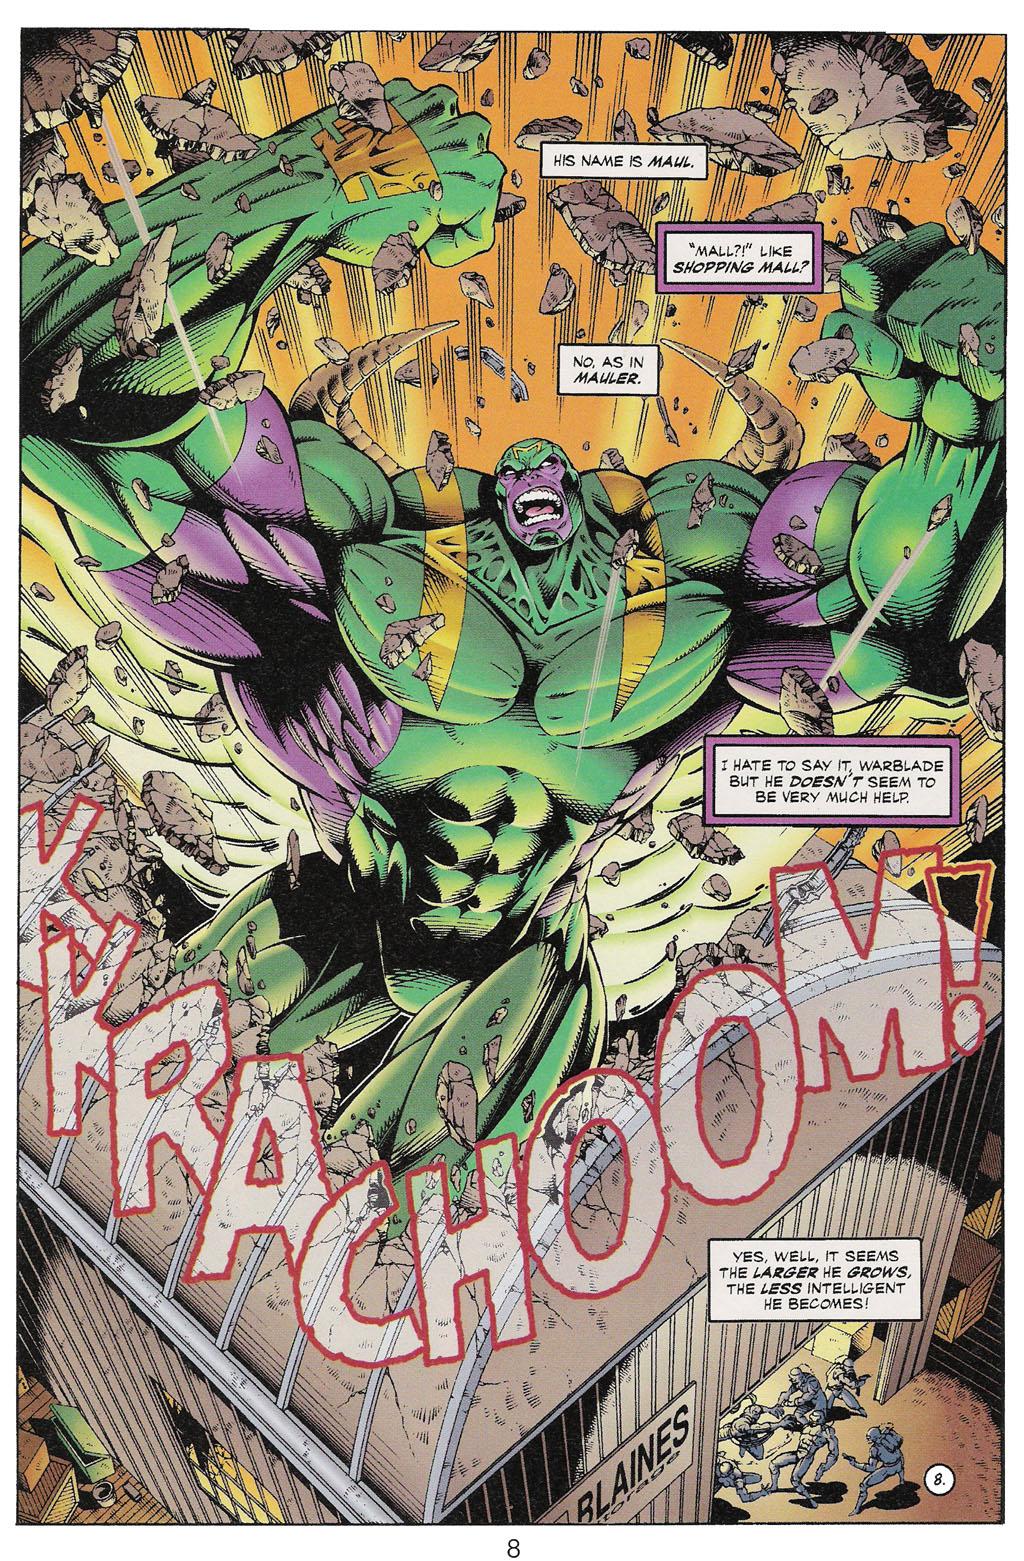 Read online ShadowHawk comic -  Issue #13 - 7